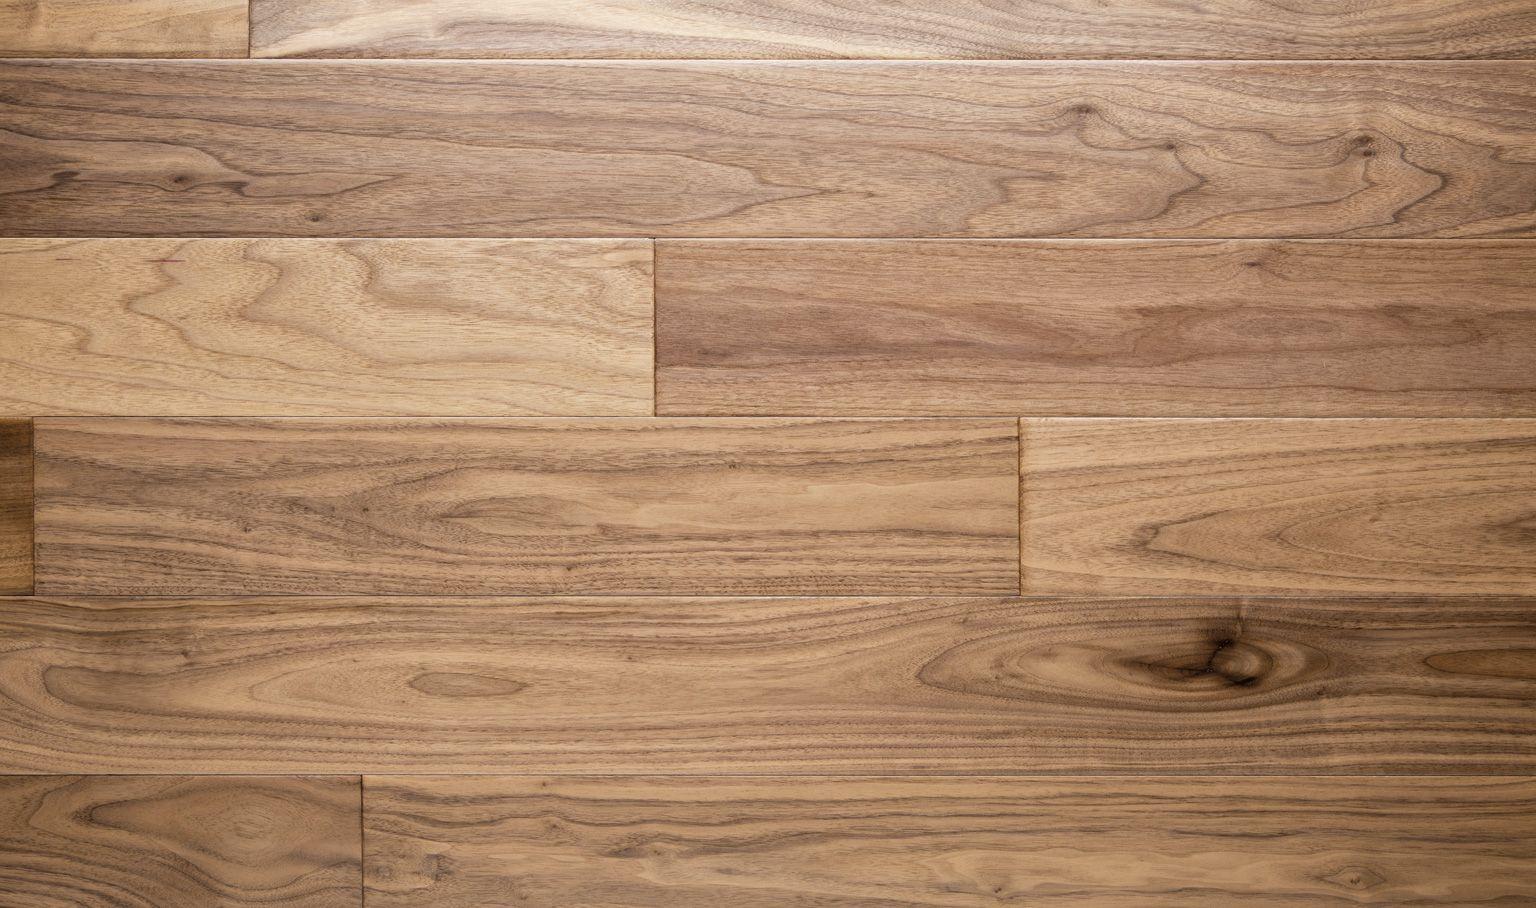 Natural  American Walnut Flooring Hand Scraped Brown